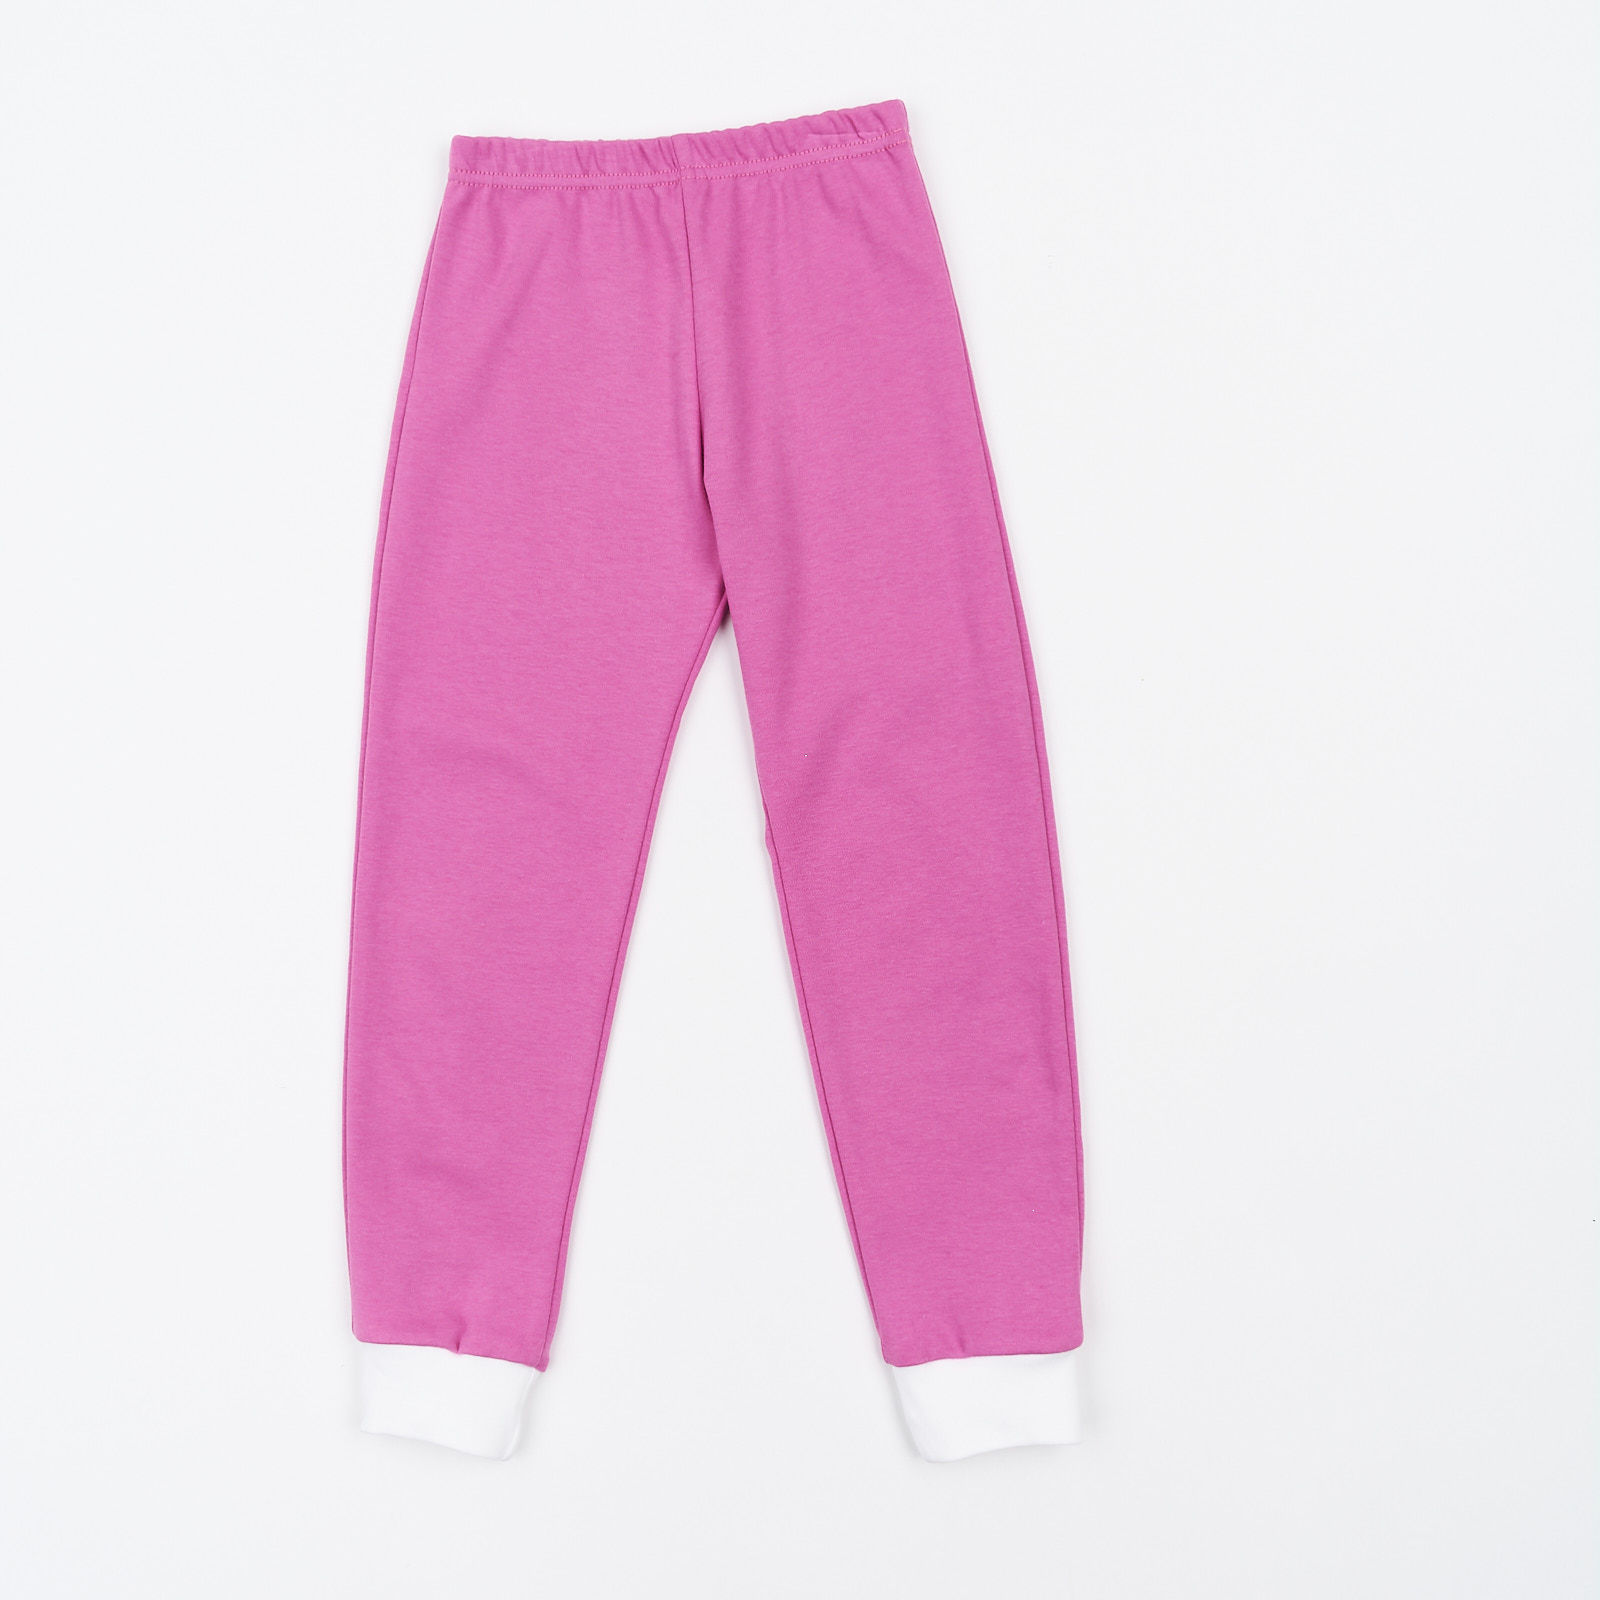 Пижама детские Garnamama модель 2EI~50841-23 цена, 2017